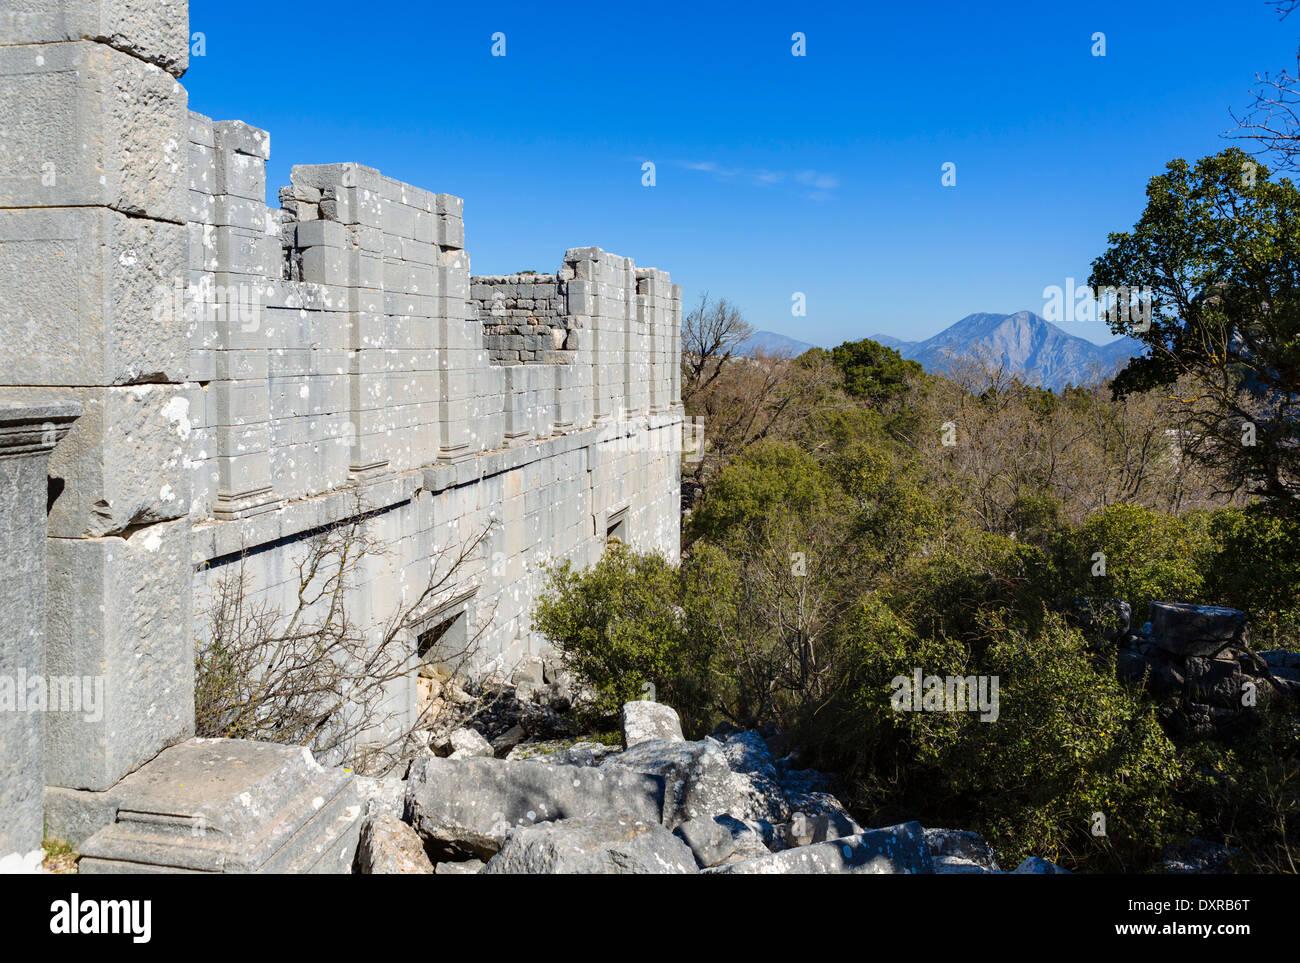 Well preserved walls of the Corinthian Temple at Termessos, Gullug Dag Milli Parki, Antalya Province, Psidia, Turkey - Stock Image